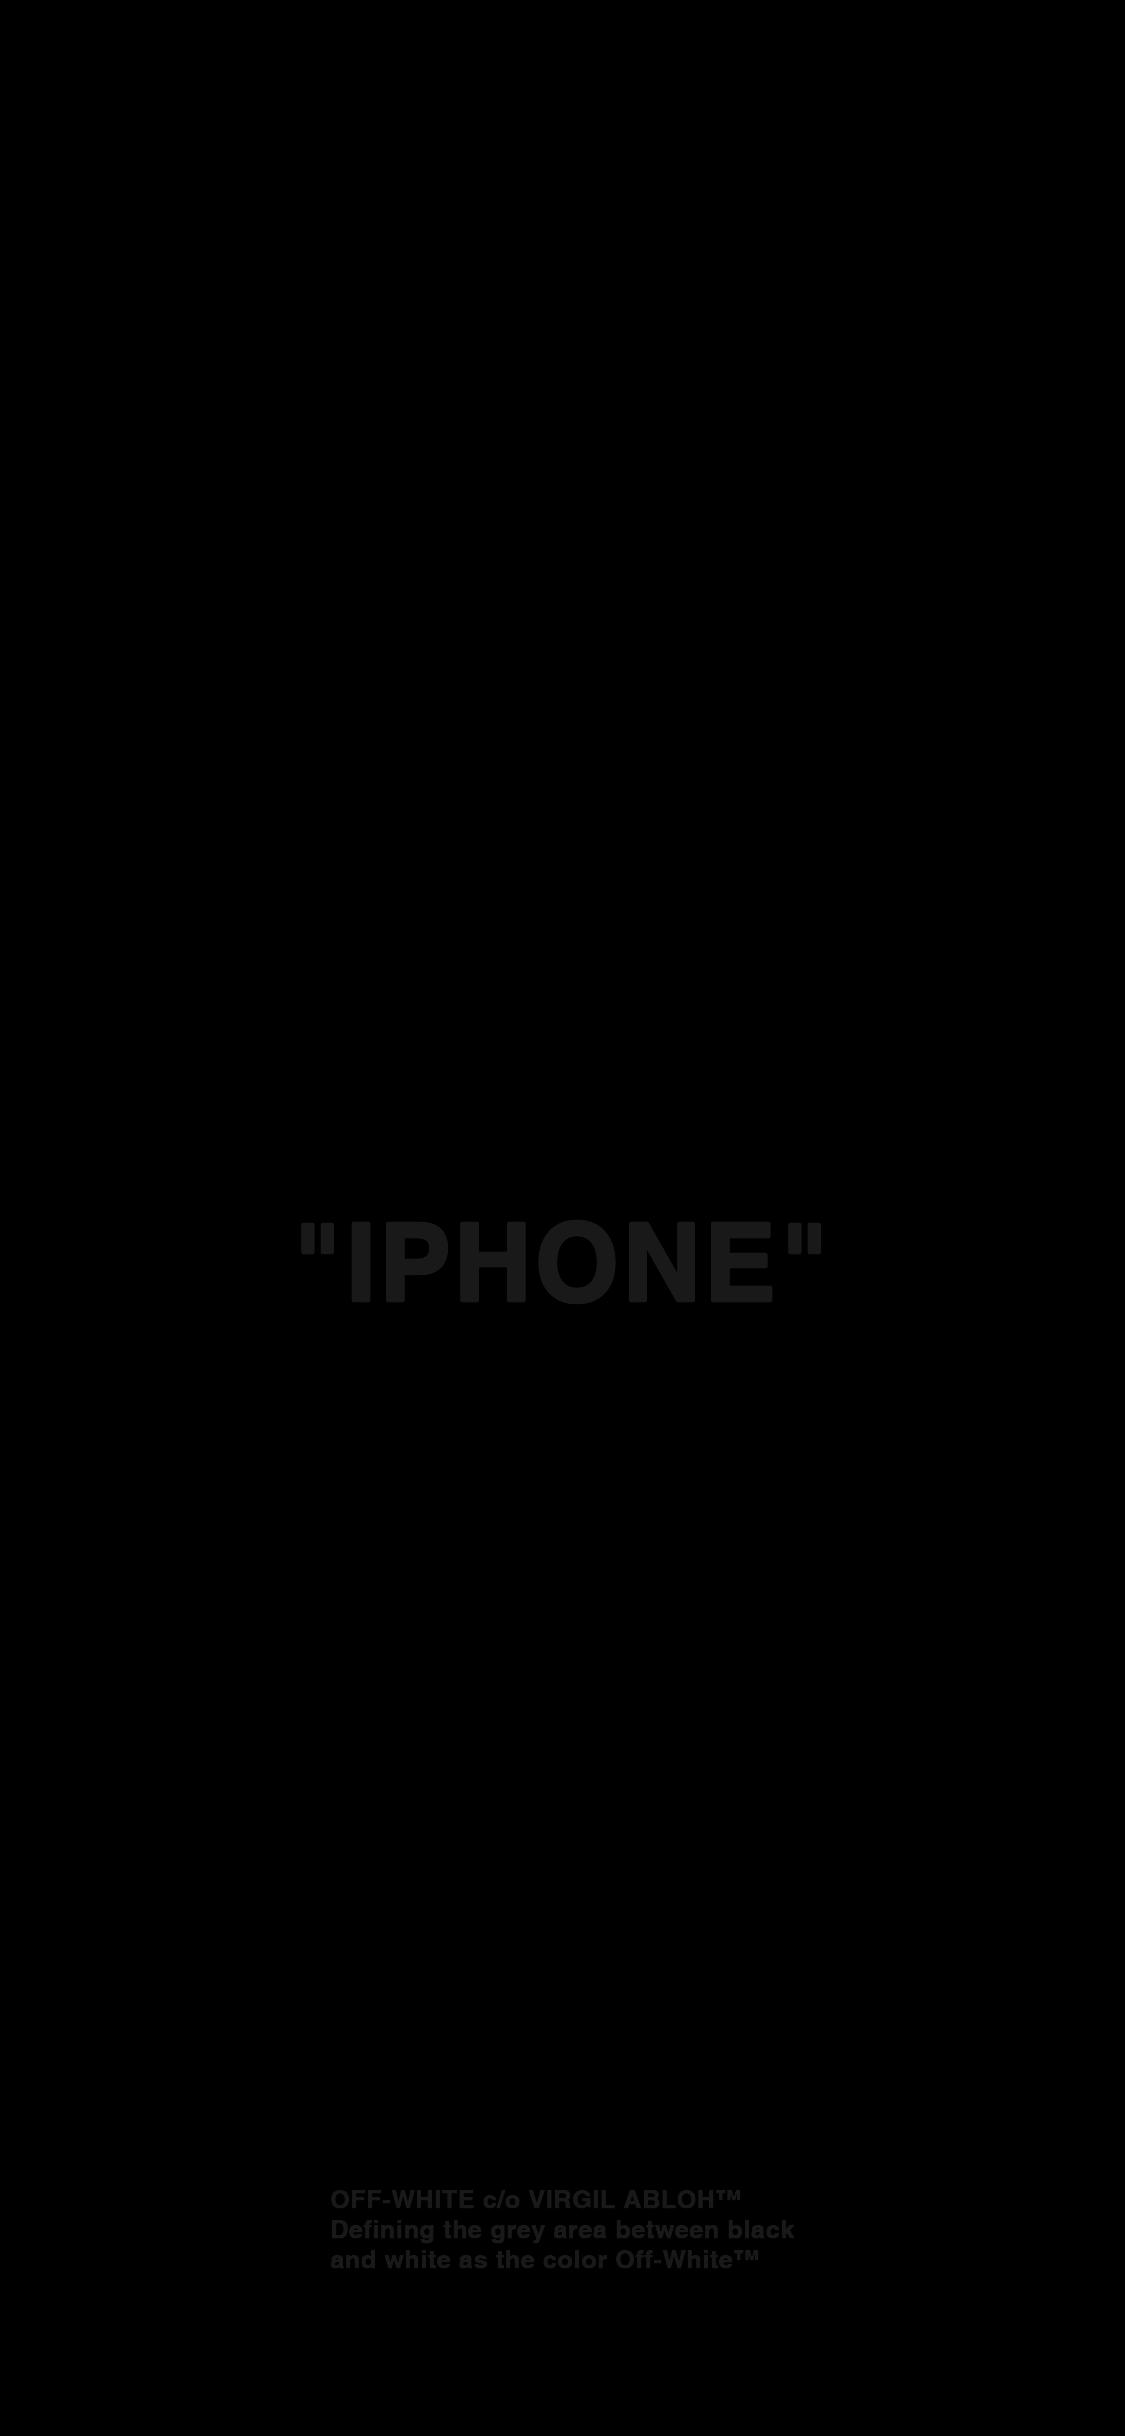 Off White Wallpaper 4k Iphone X Ideas 4k White Wallpaper For Iphone Hypebeast Iphone Wallpaper White Wallpaper